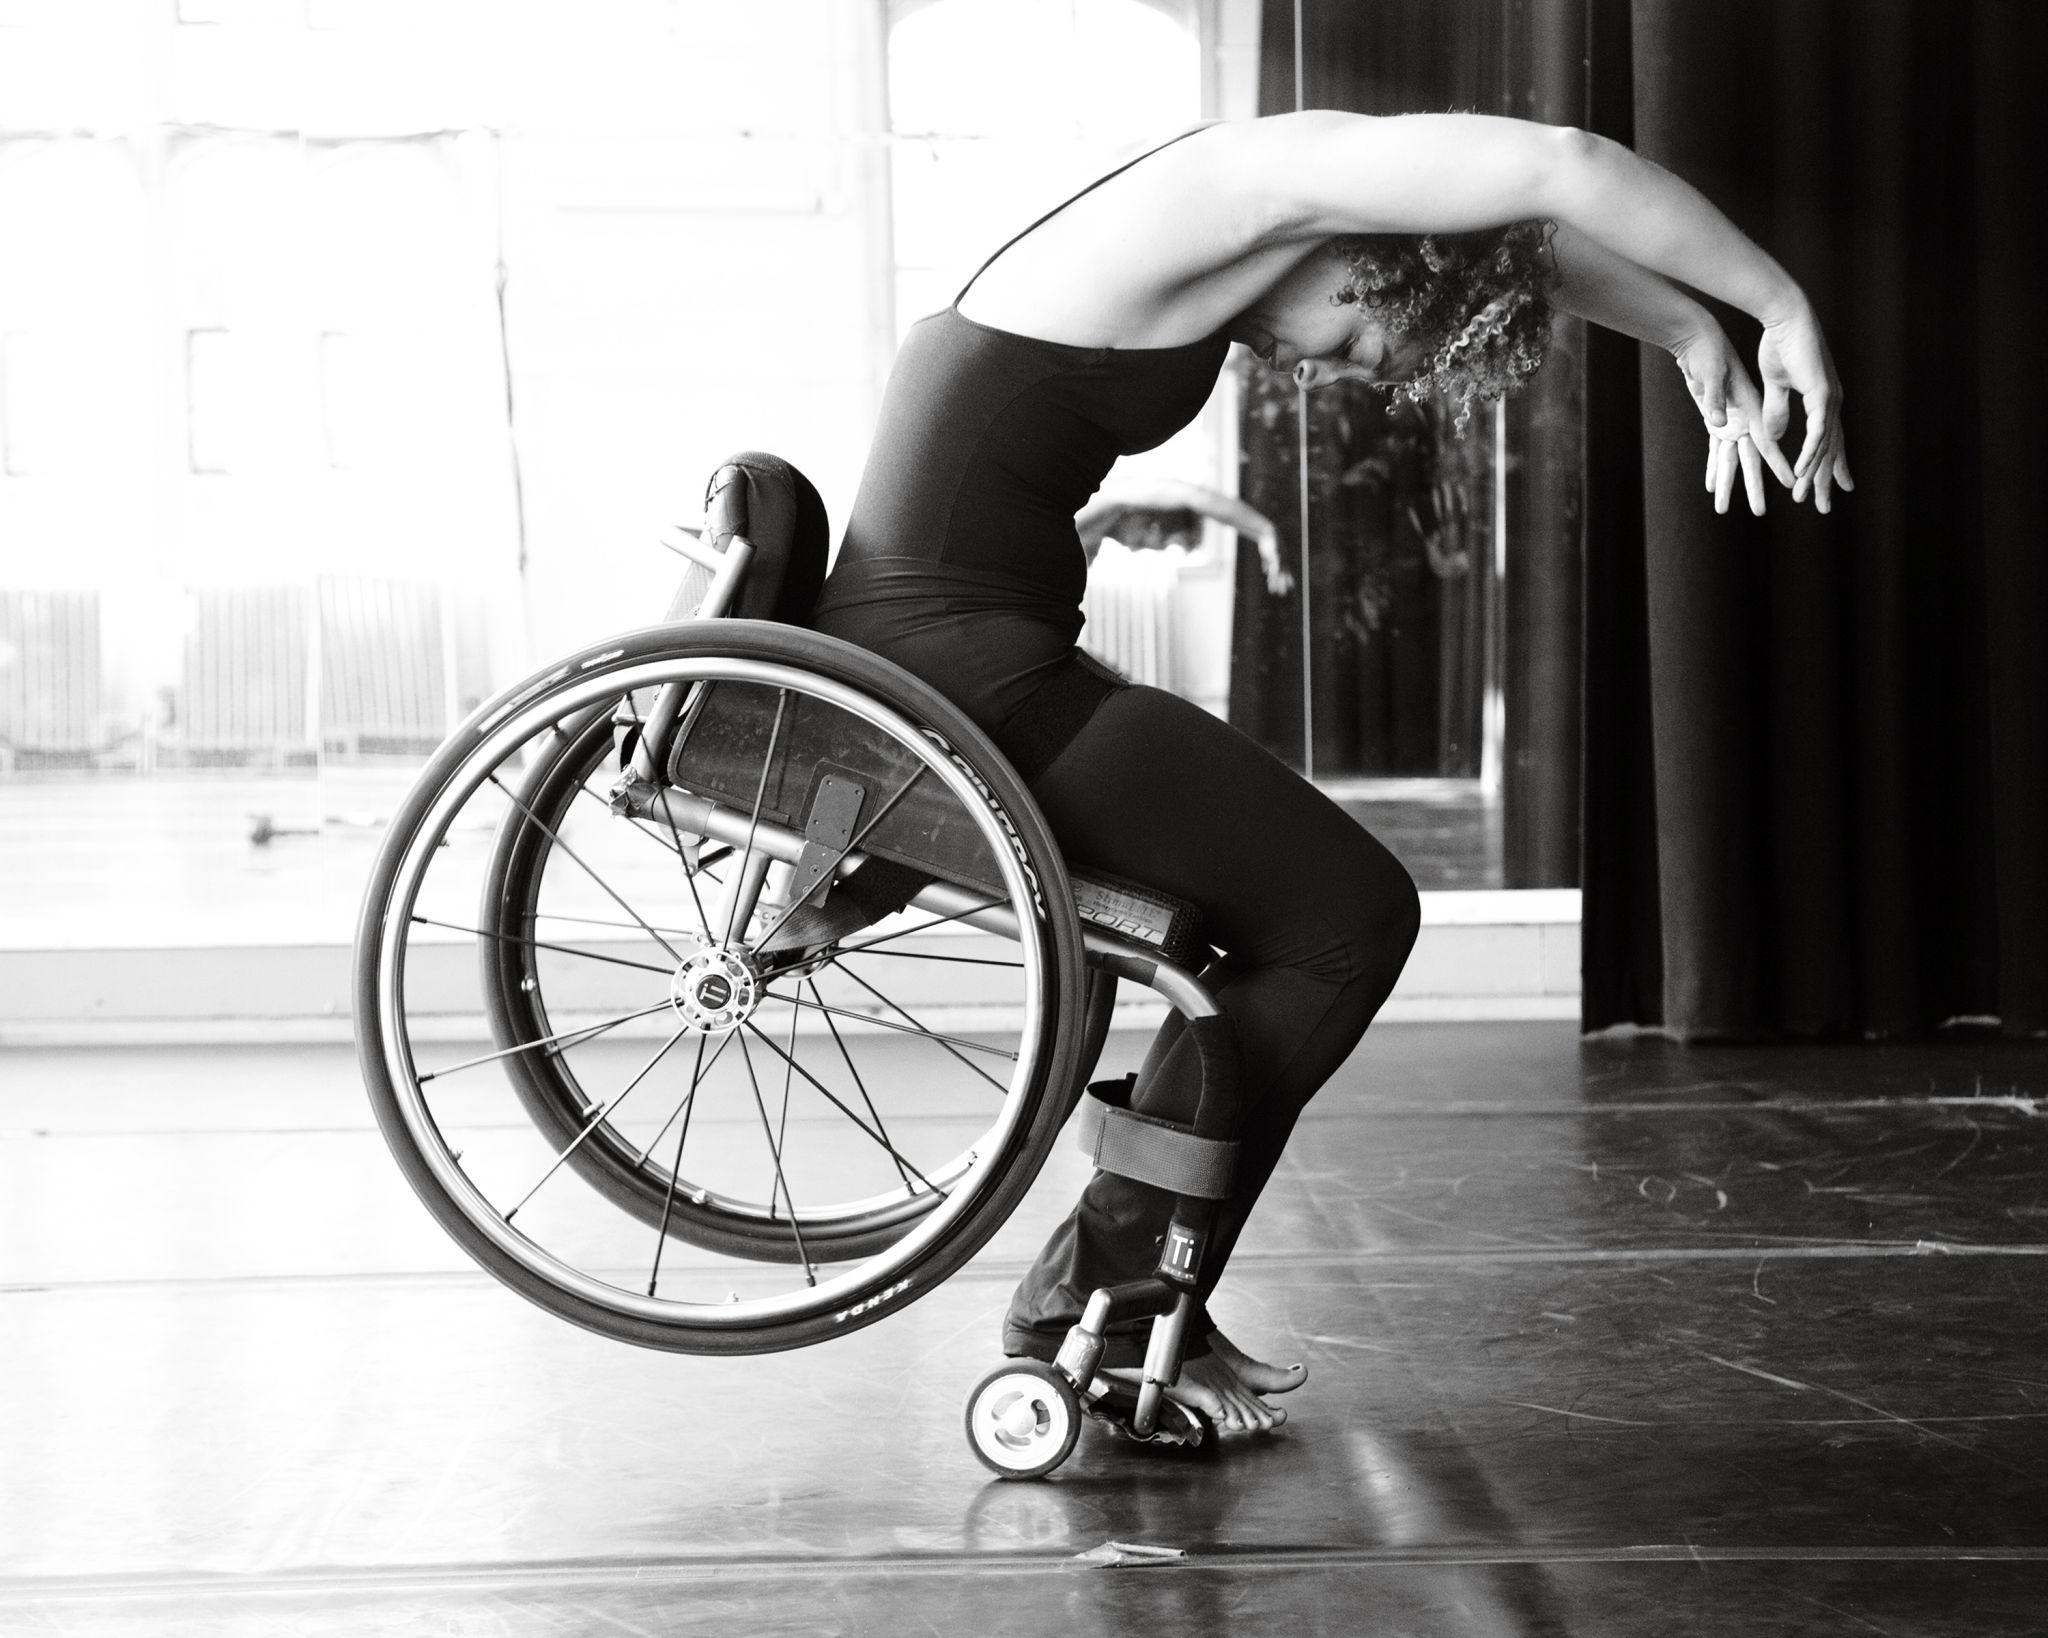 wheelchair-dance-2-1024x819@2x.jpg